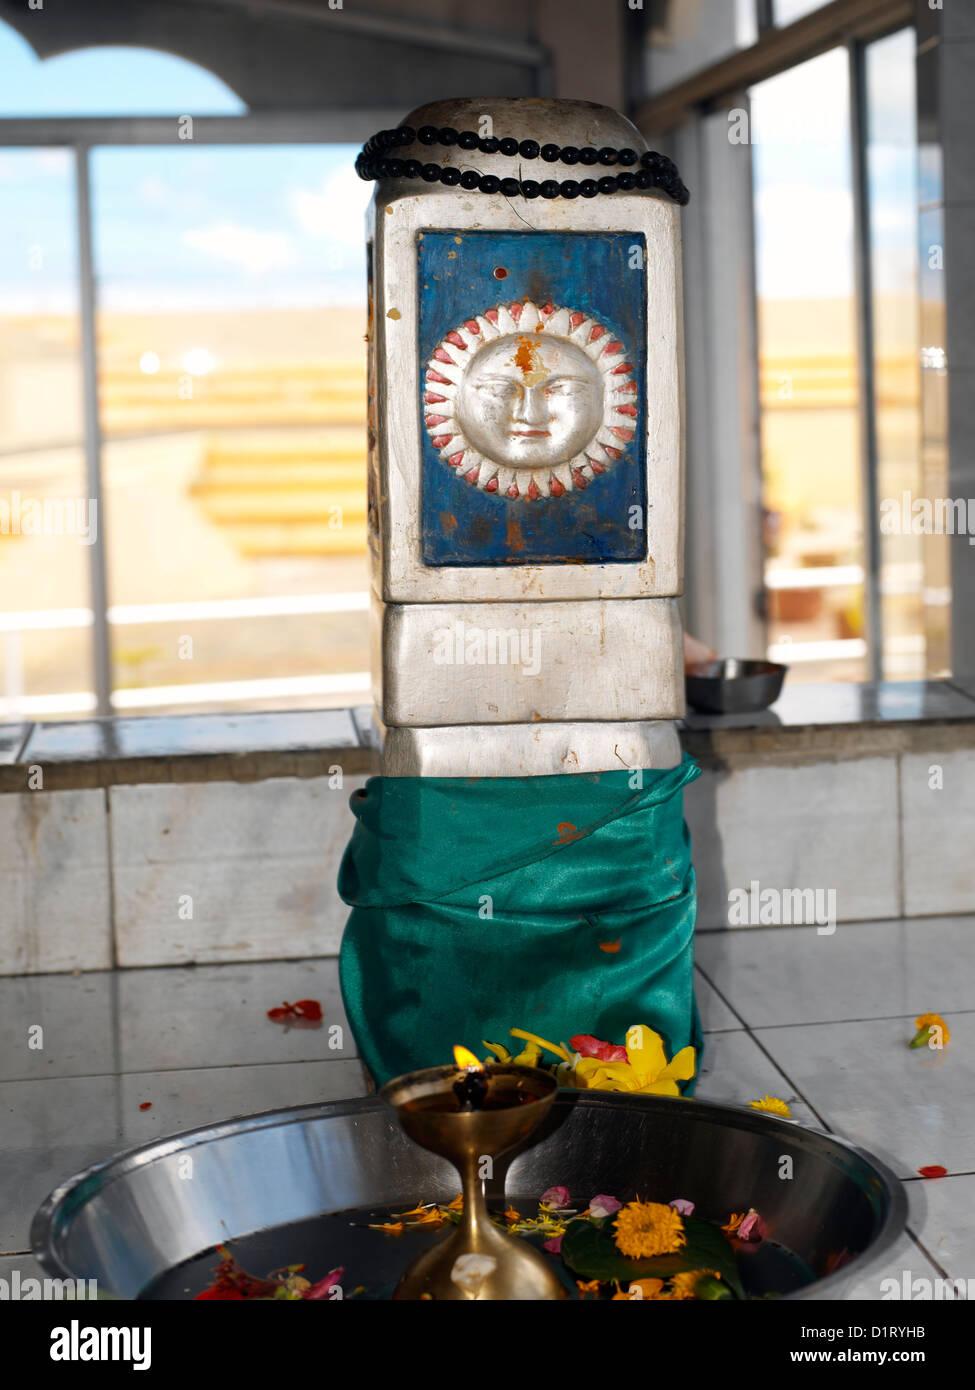 Ganga Talao Grand Bassin Maurice Surya Der dieu soleil dans un temple hindou Banque D'Images